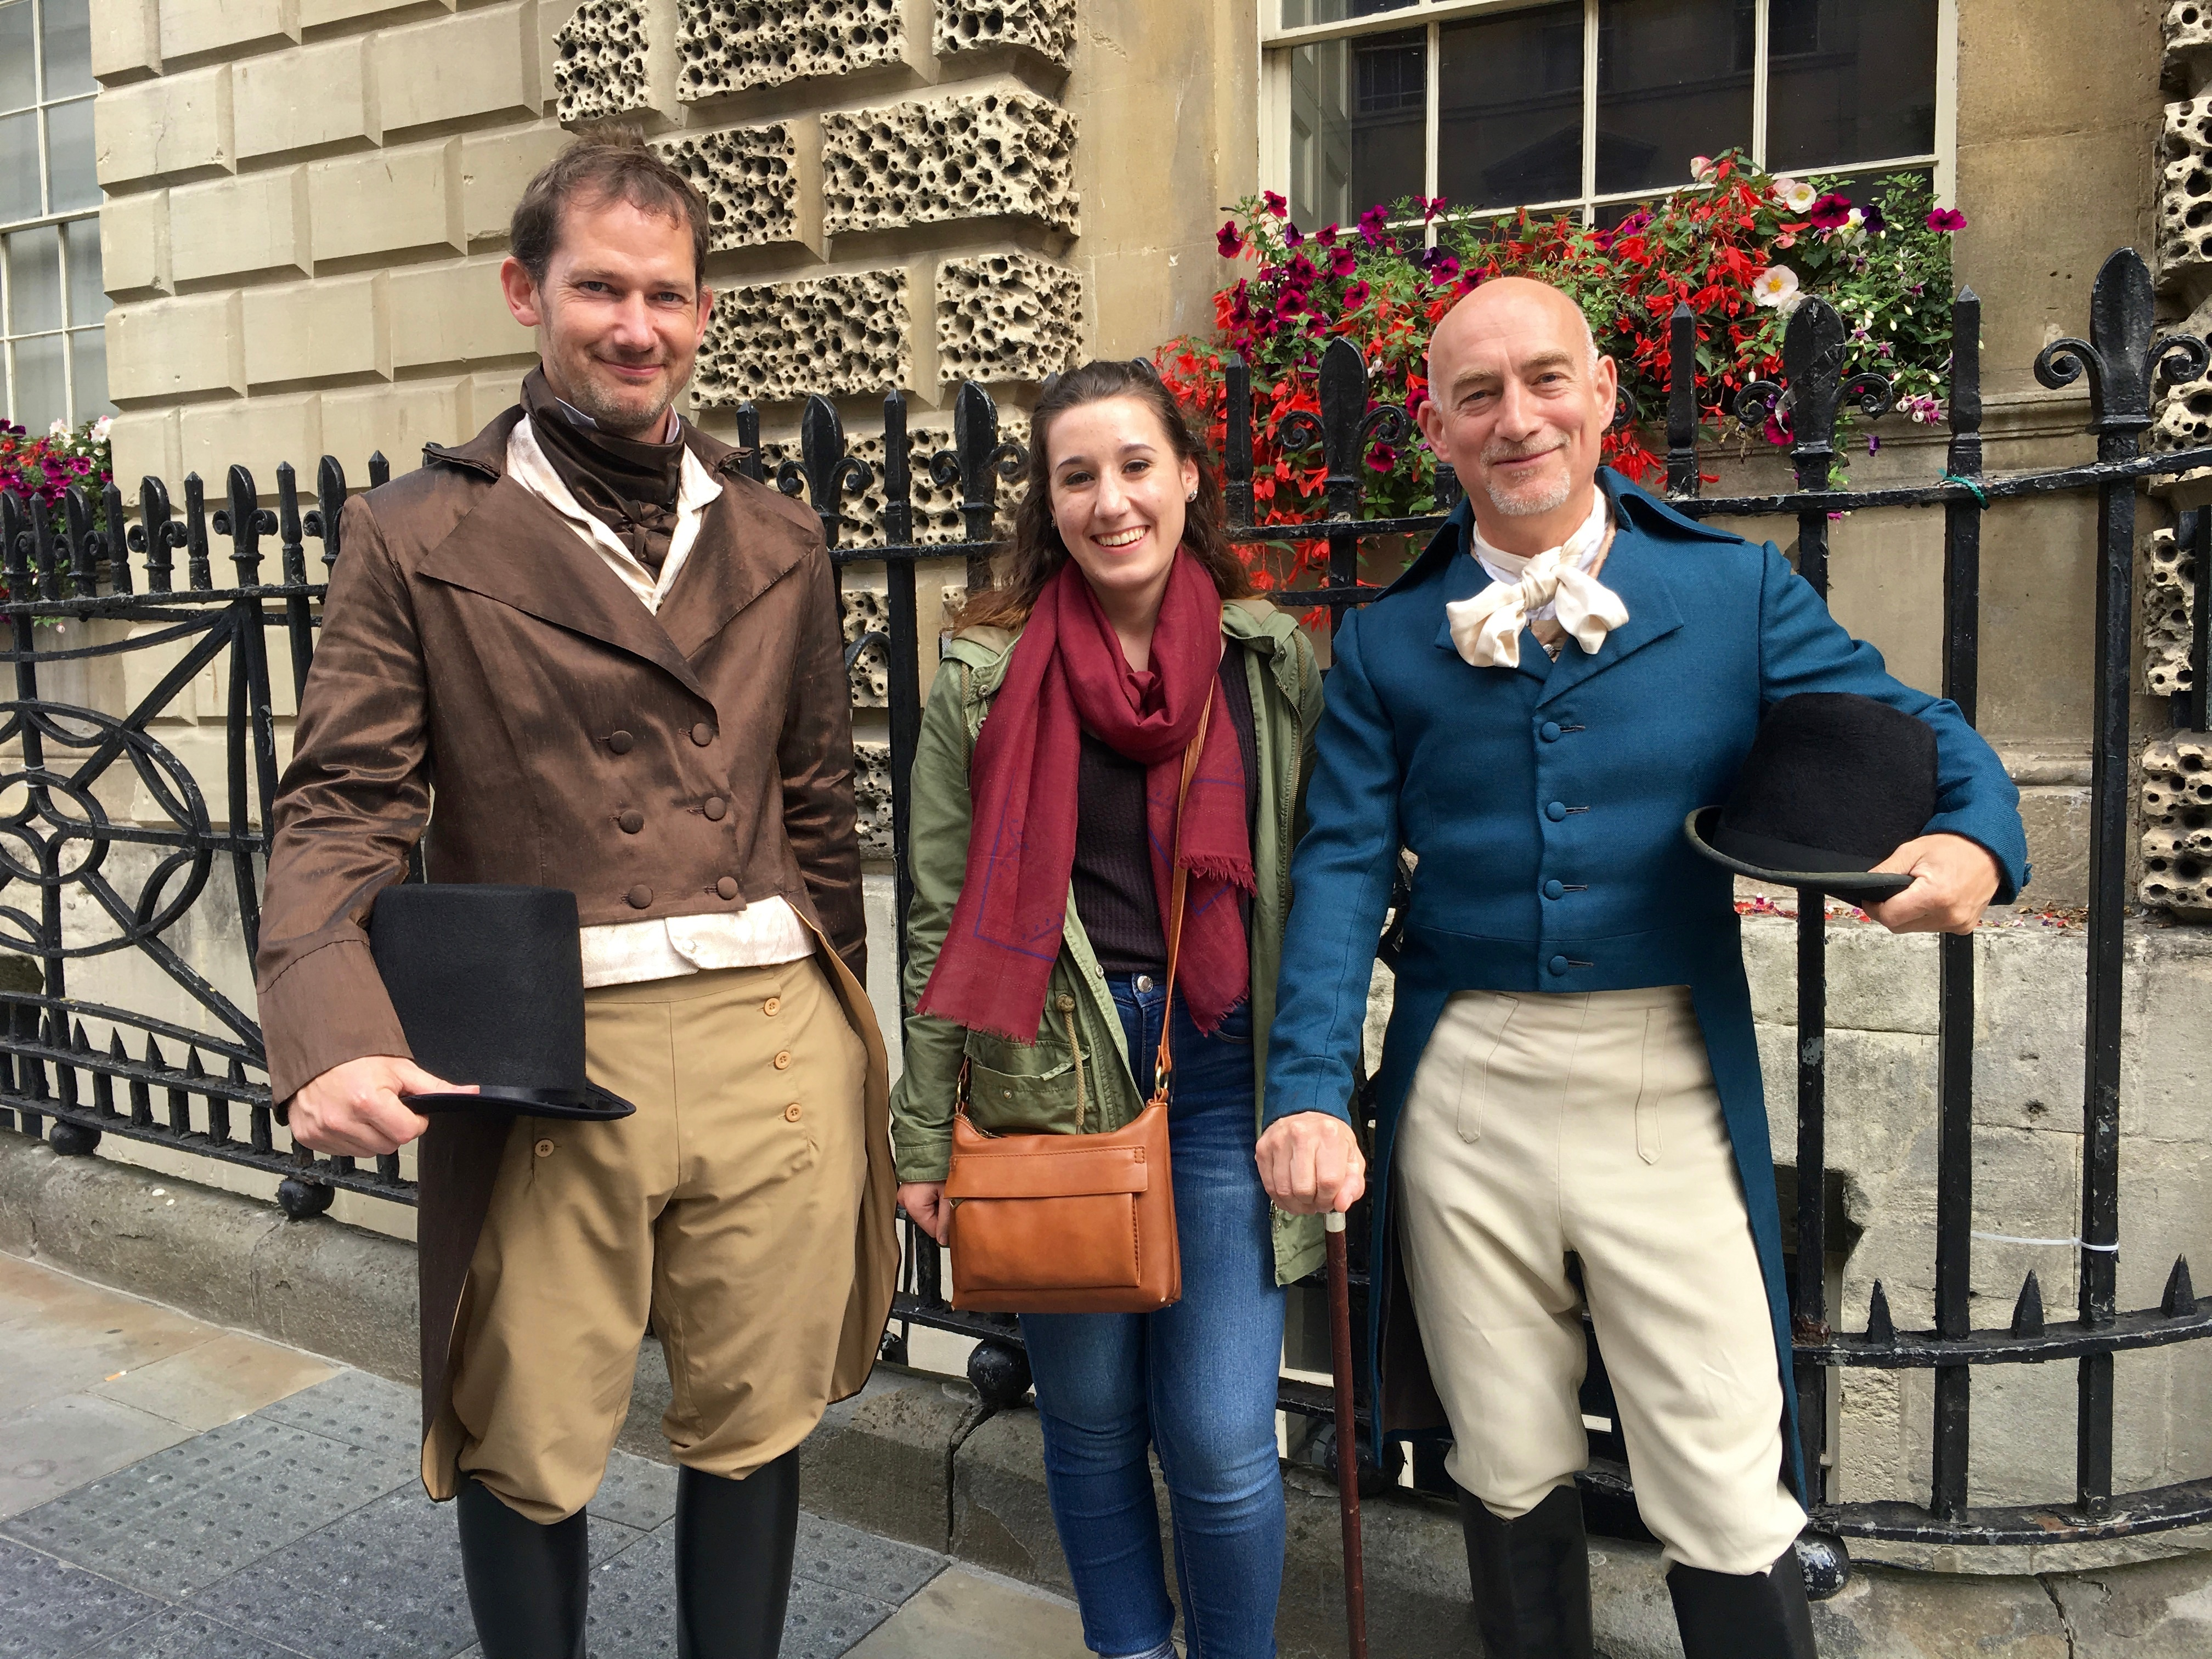 People in Regency Outfits at the Jane Austen Festival in Bath